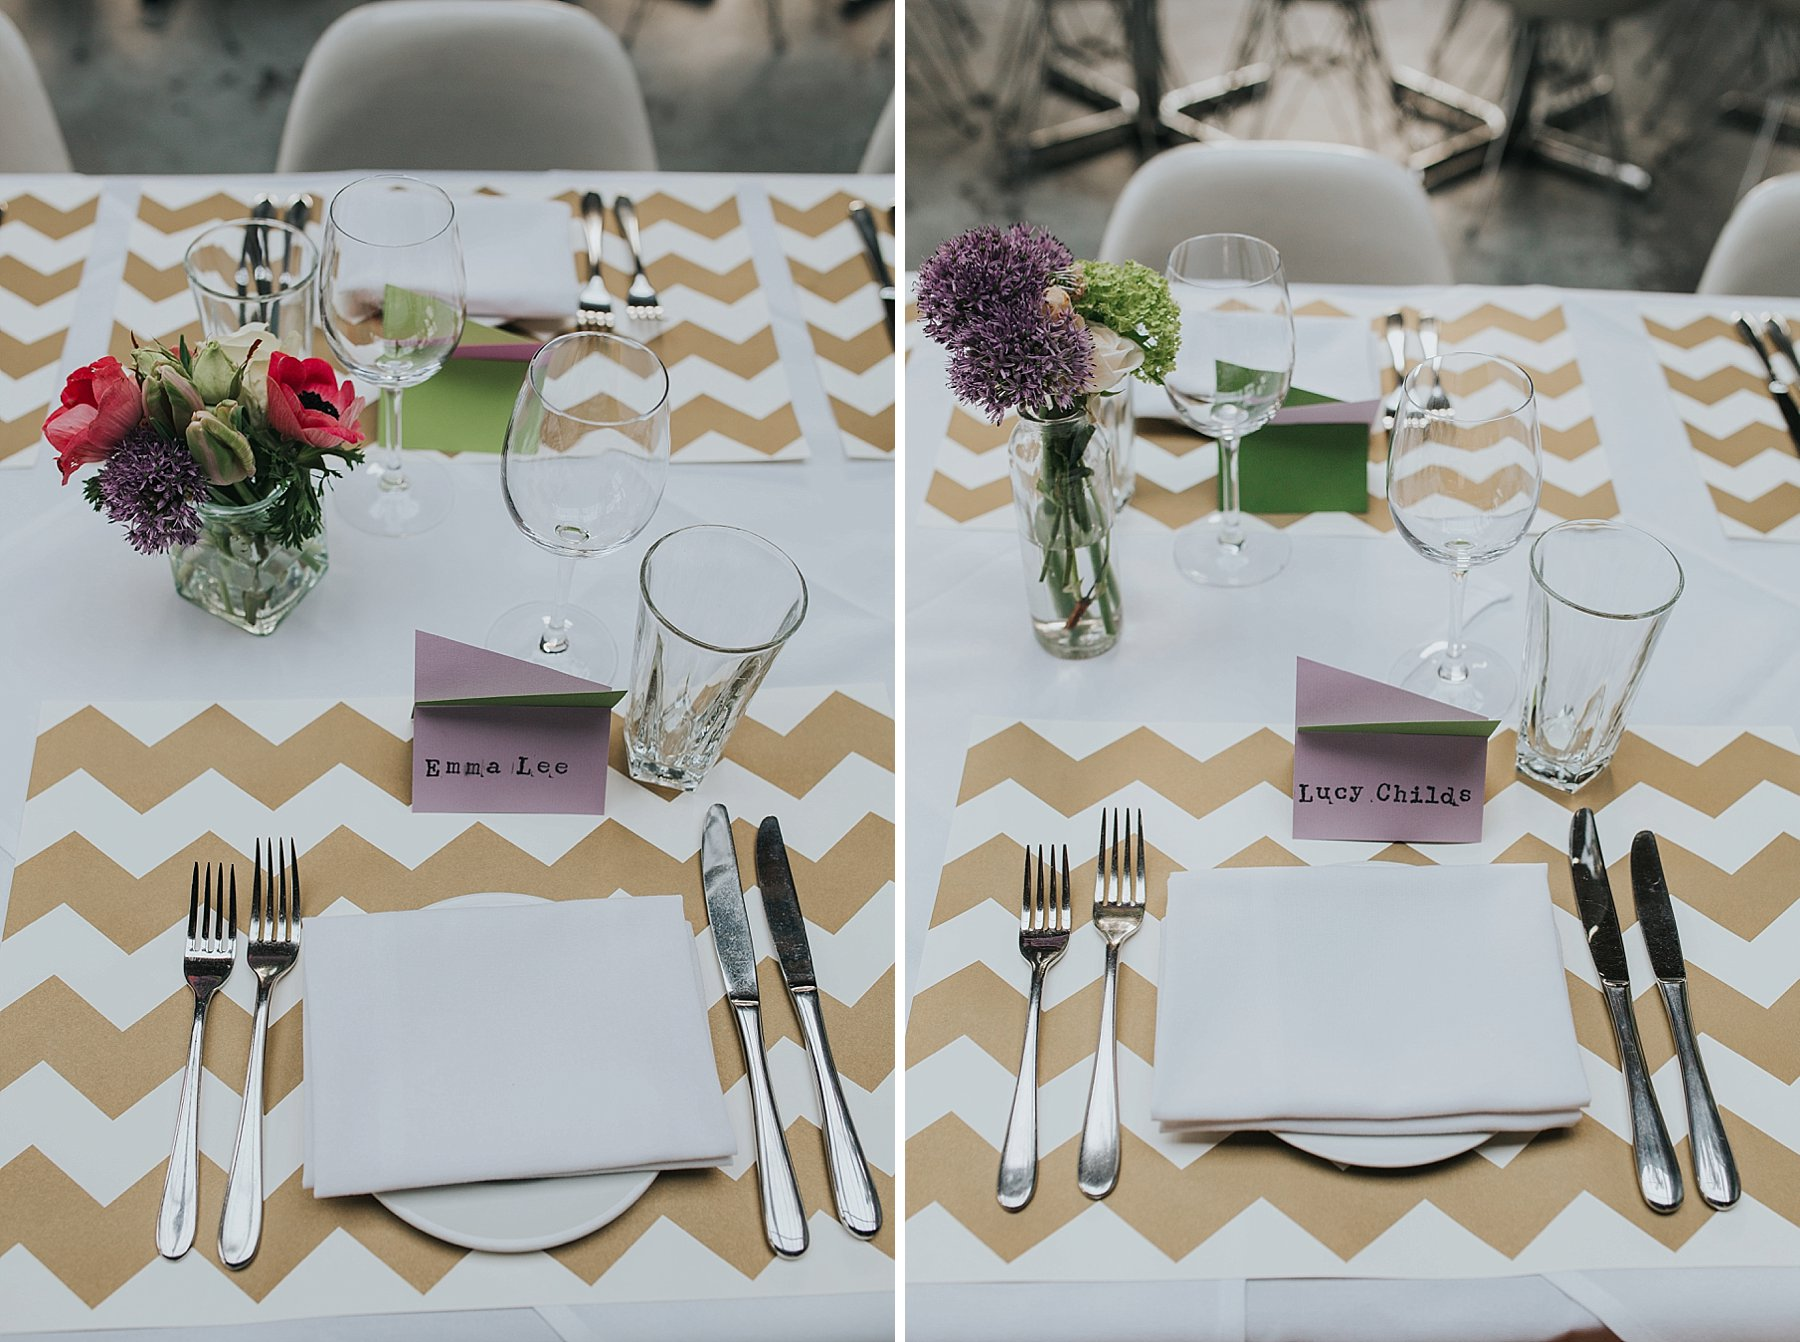 25-St Chads Place wedding gold chevron table mulit colour geometric place names.jpg